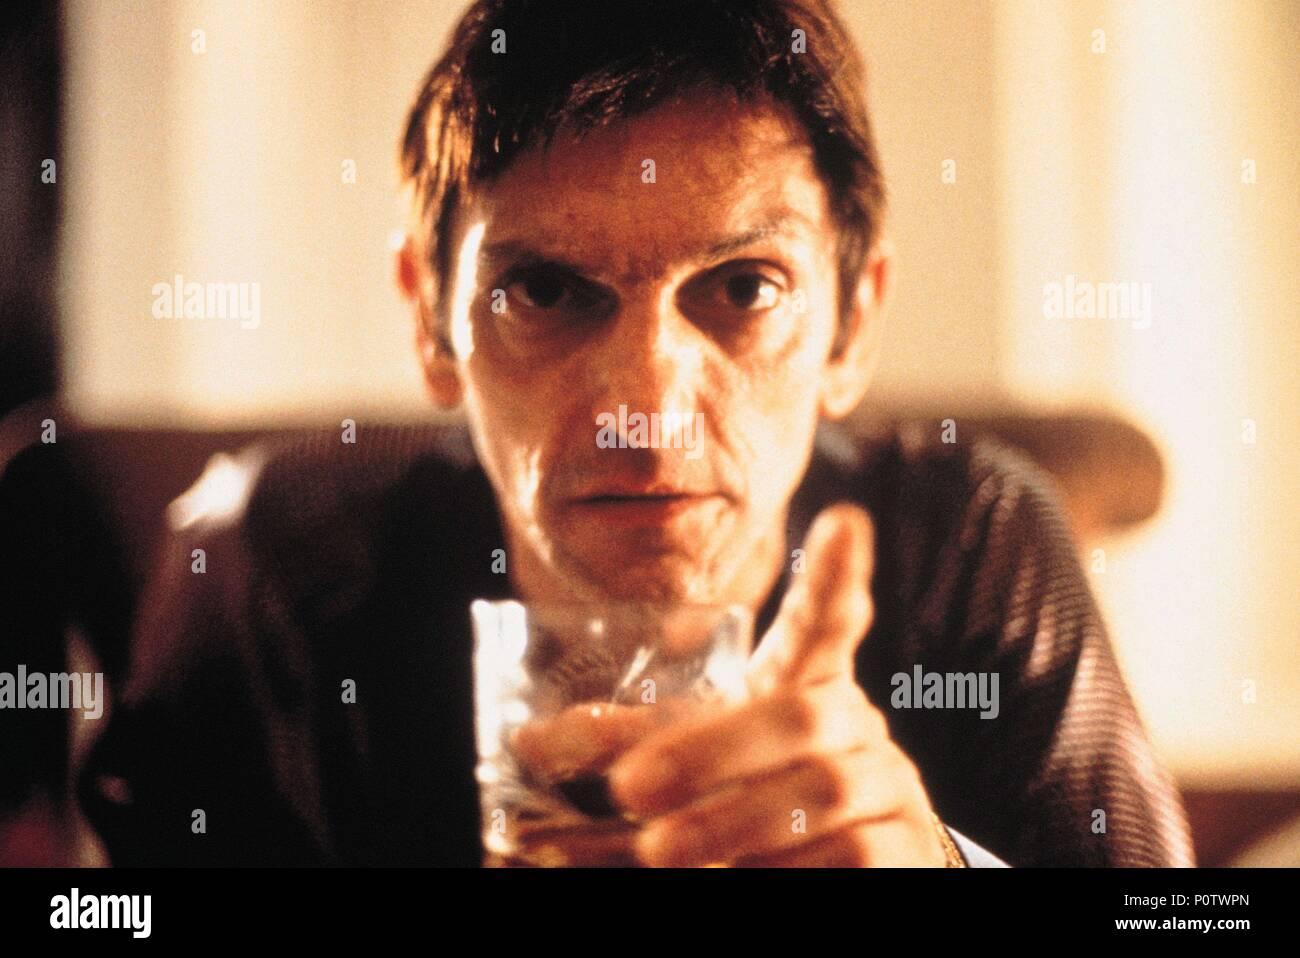 Original Film Title: O INVASOR.  English Title: TRESPASSER, THE.  Film Director: BETO BRANT.  Year: 2002. Credit: DRAMA FILMES/TIBET FILME/EUROPA FILMES/VIDEOFILMES/QUANDRA / Album - Stock Image